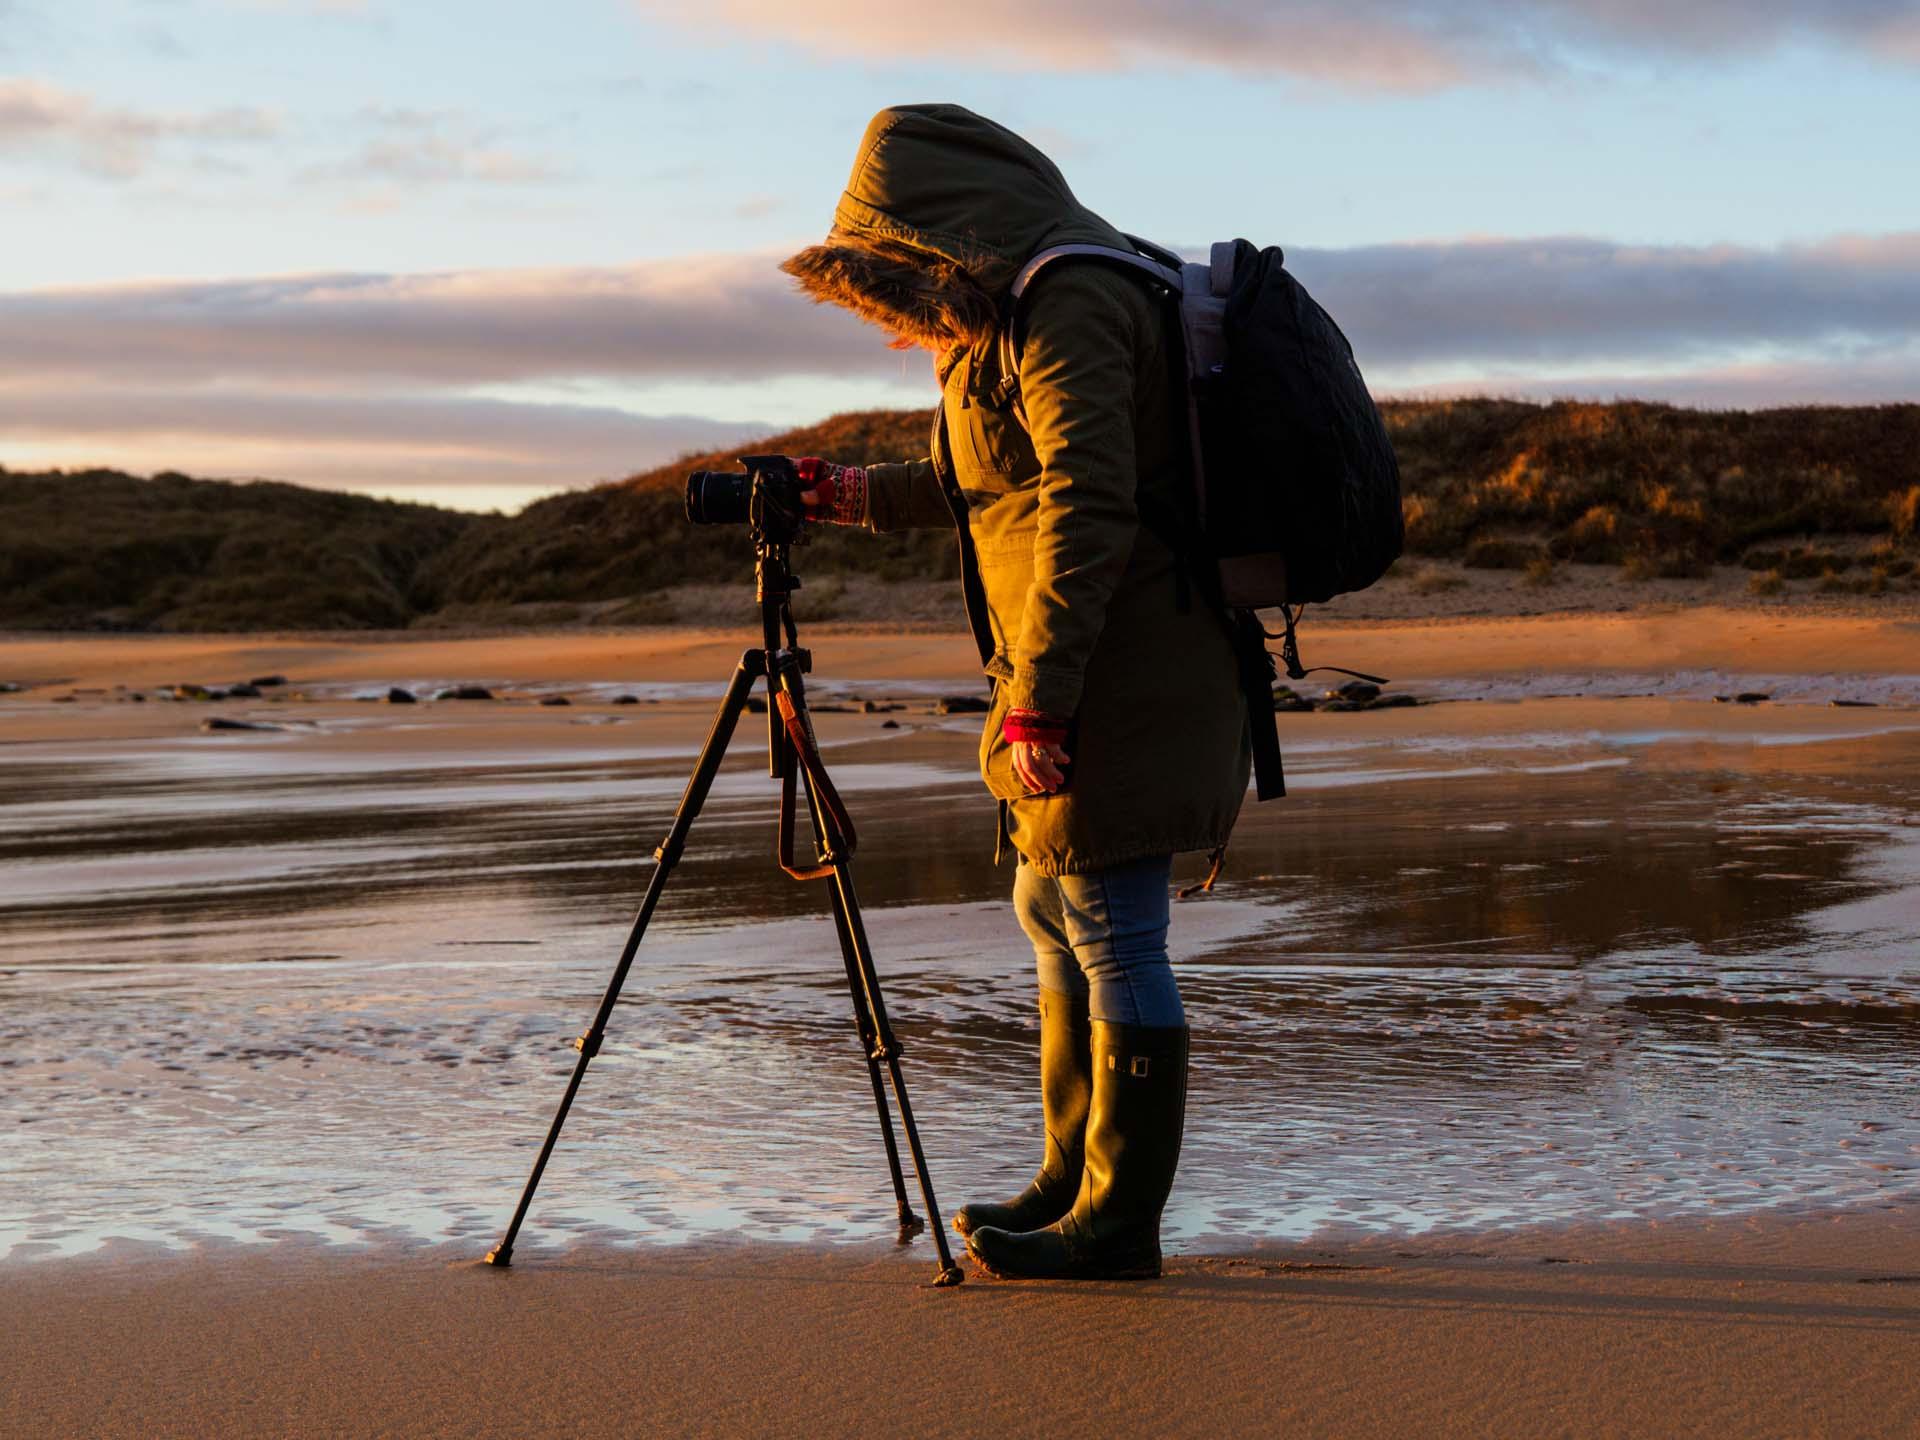 Photography Training with Ivor Rackham